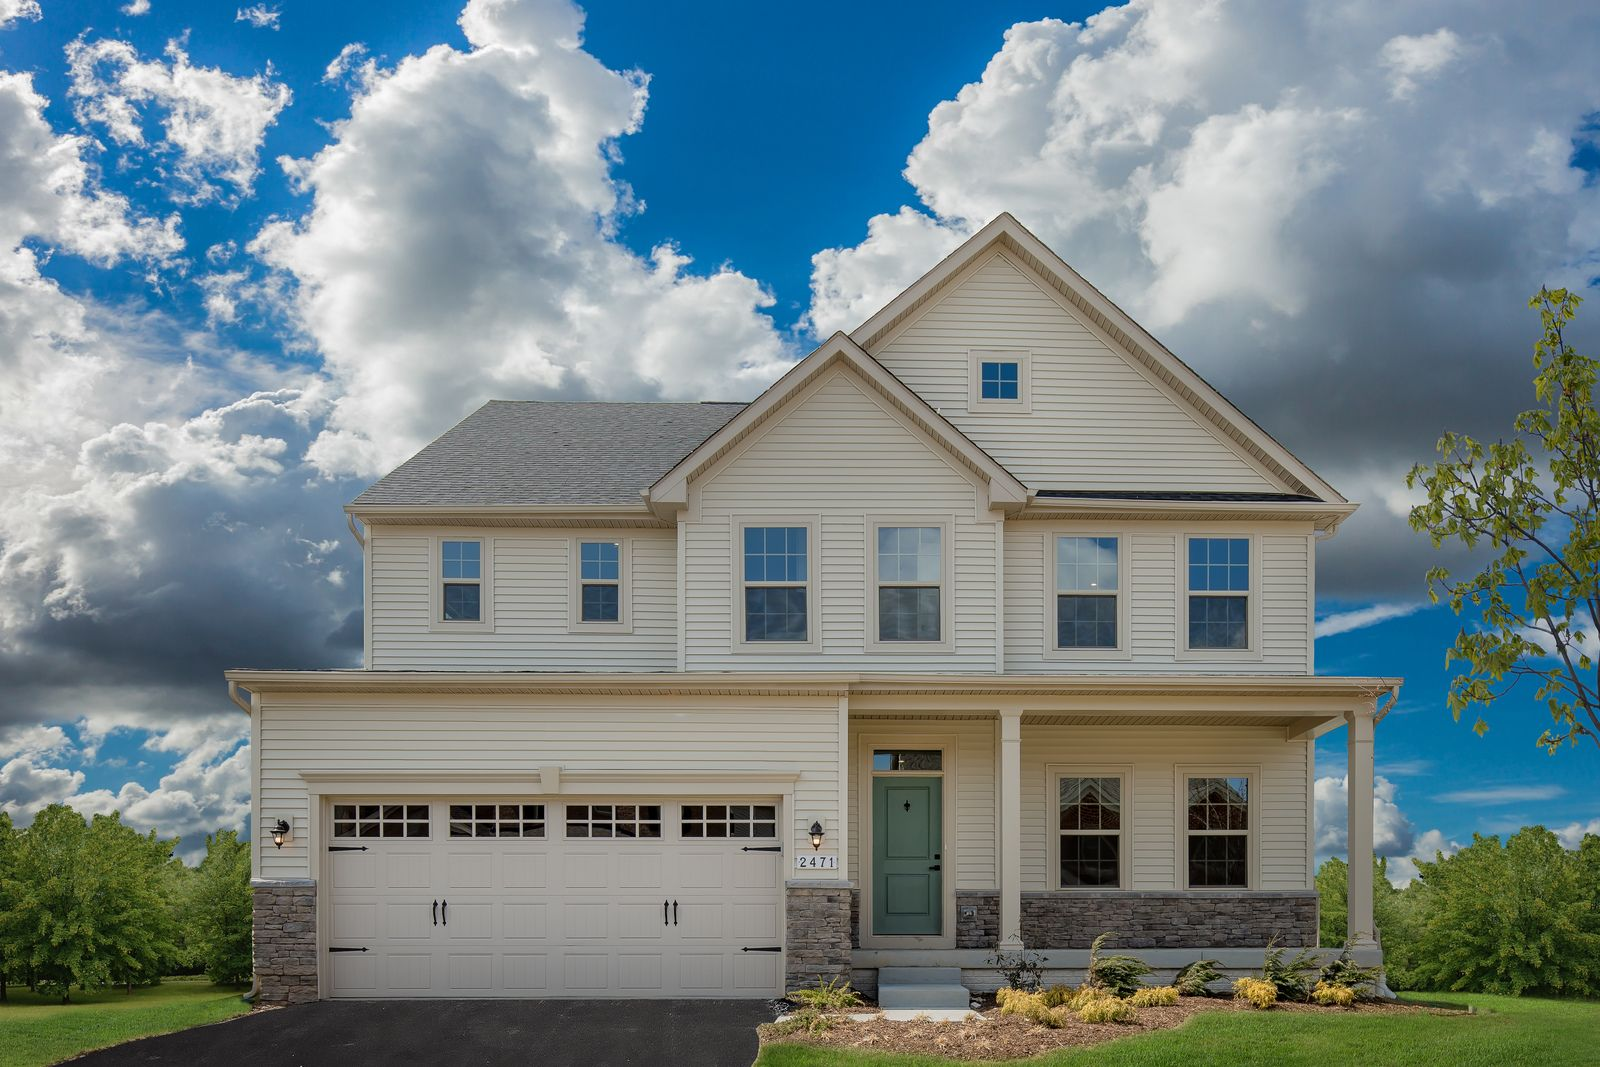 Single Family for Sale at Rainwater - Lehigh 110 Santa Anna Way Duncan, South Carolina 29334 United States